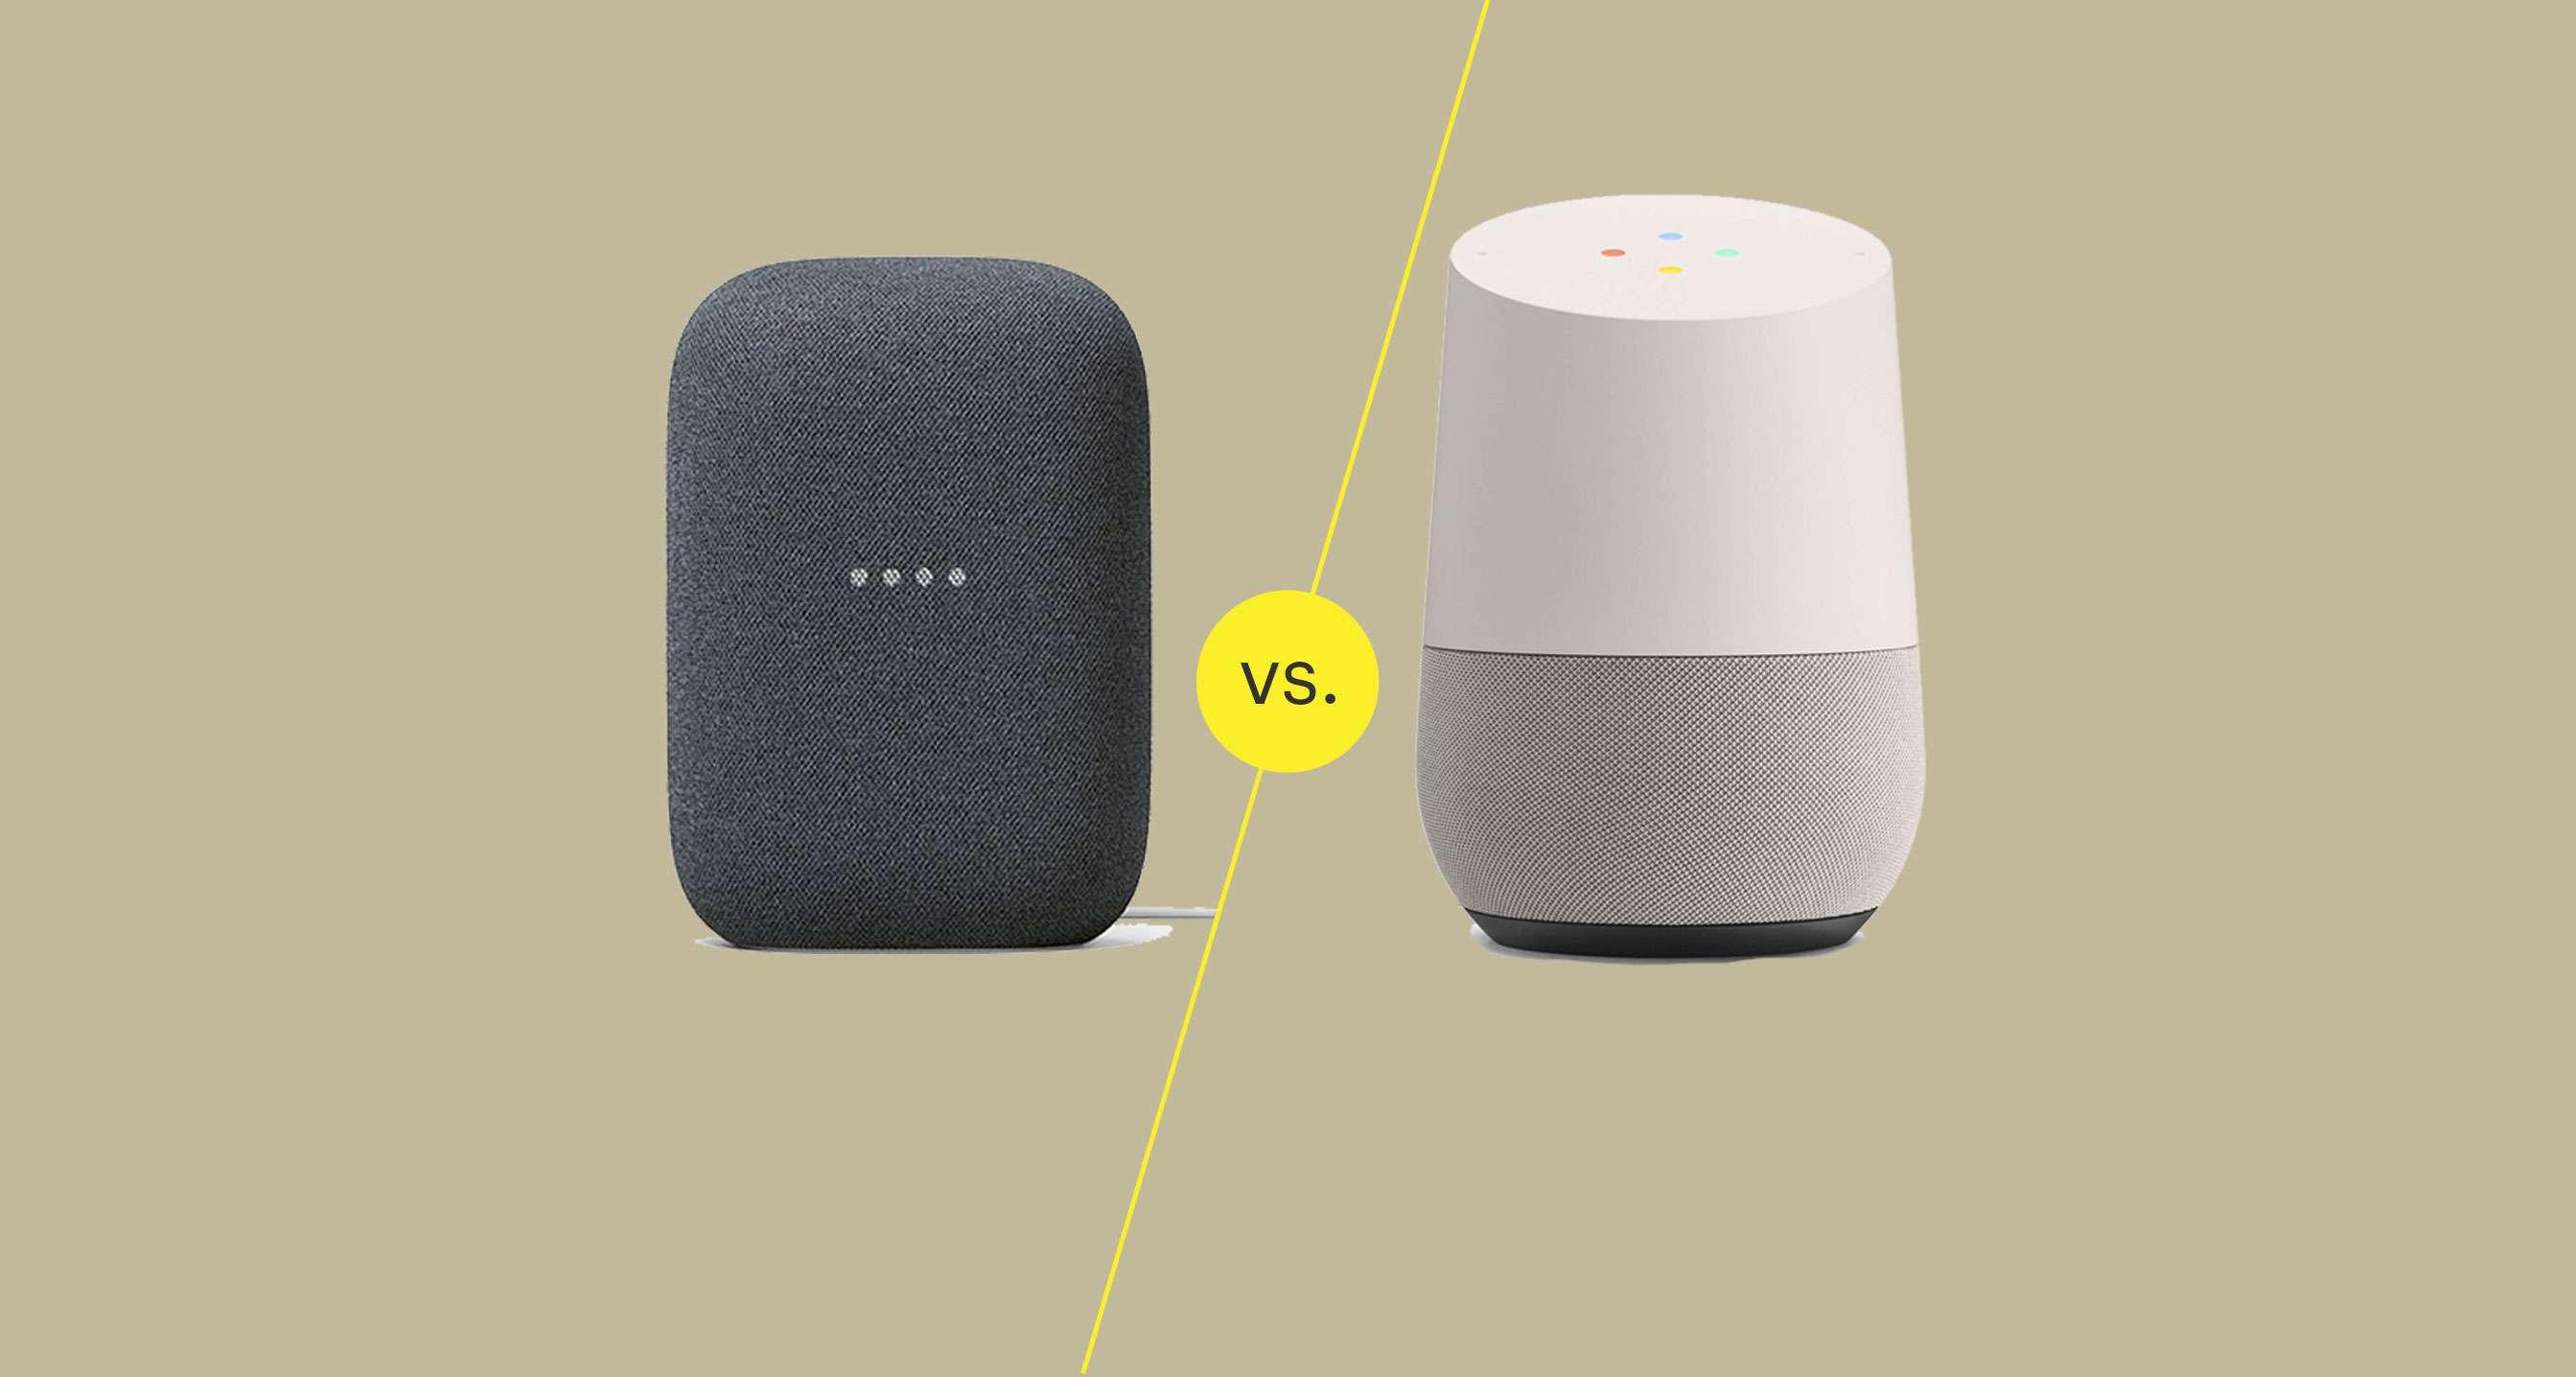 Google Home vs. Nest Audio